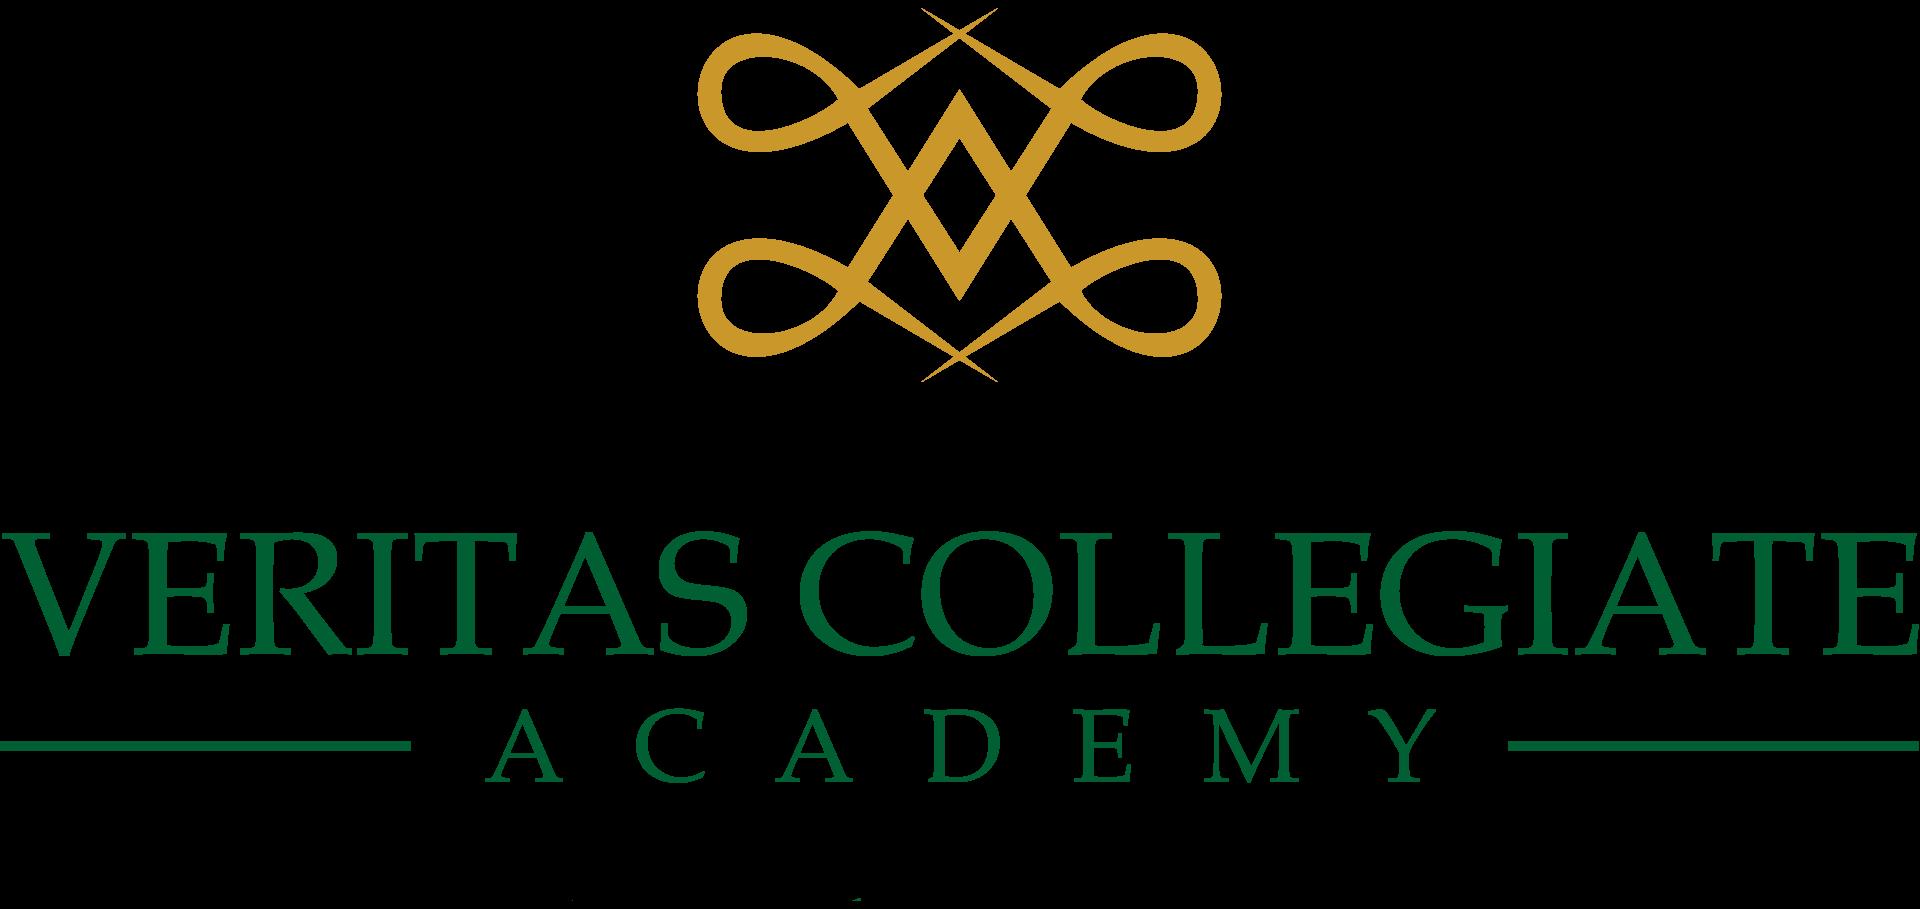 VCA DC Logo 1 PNG